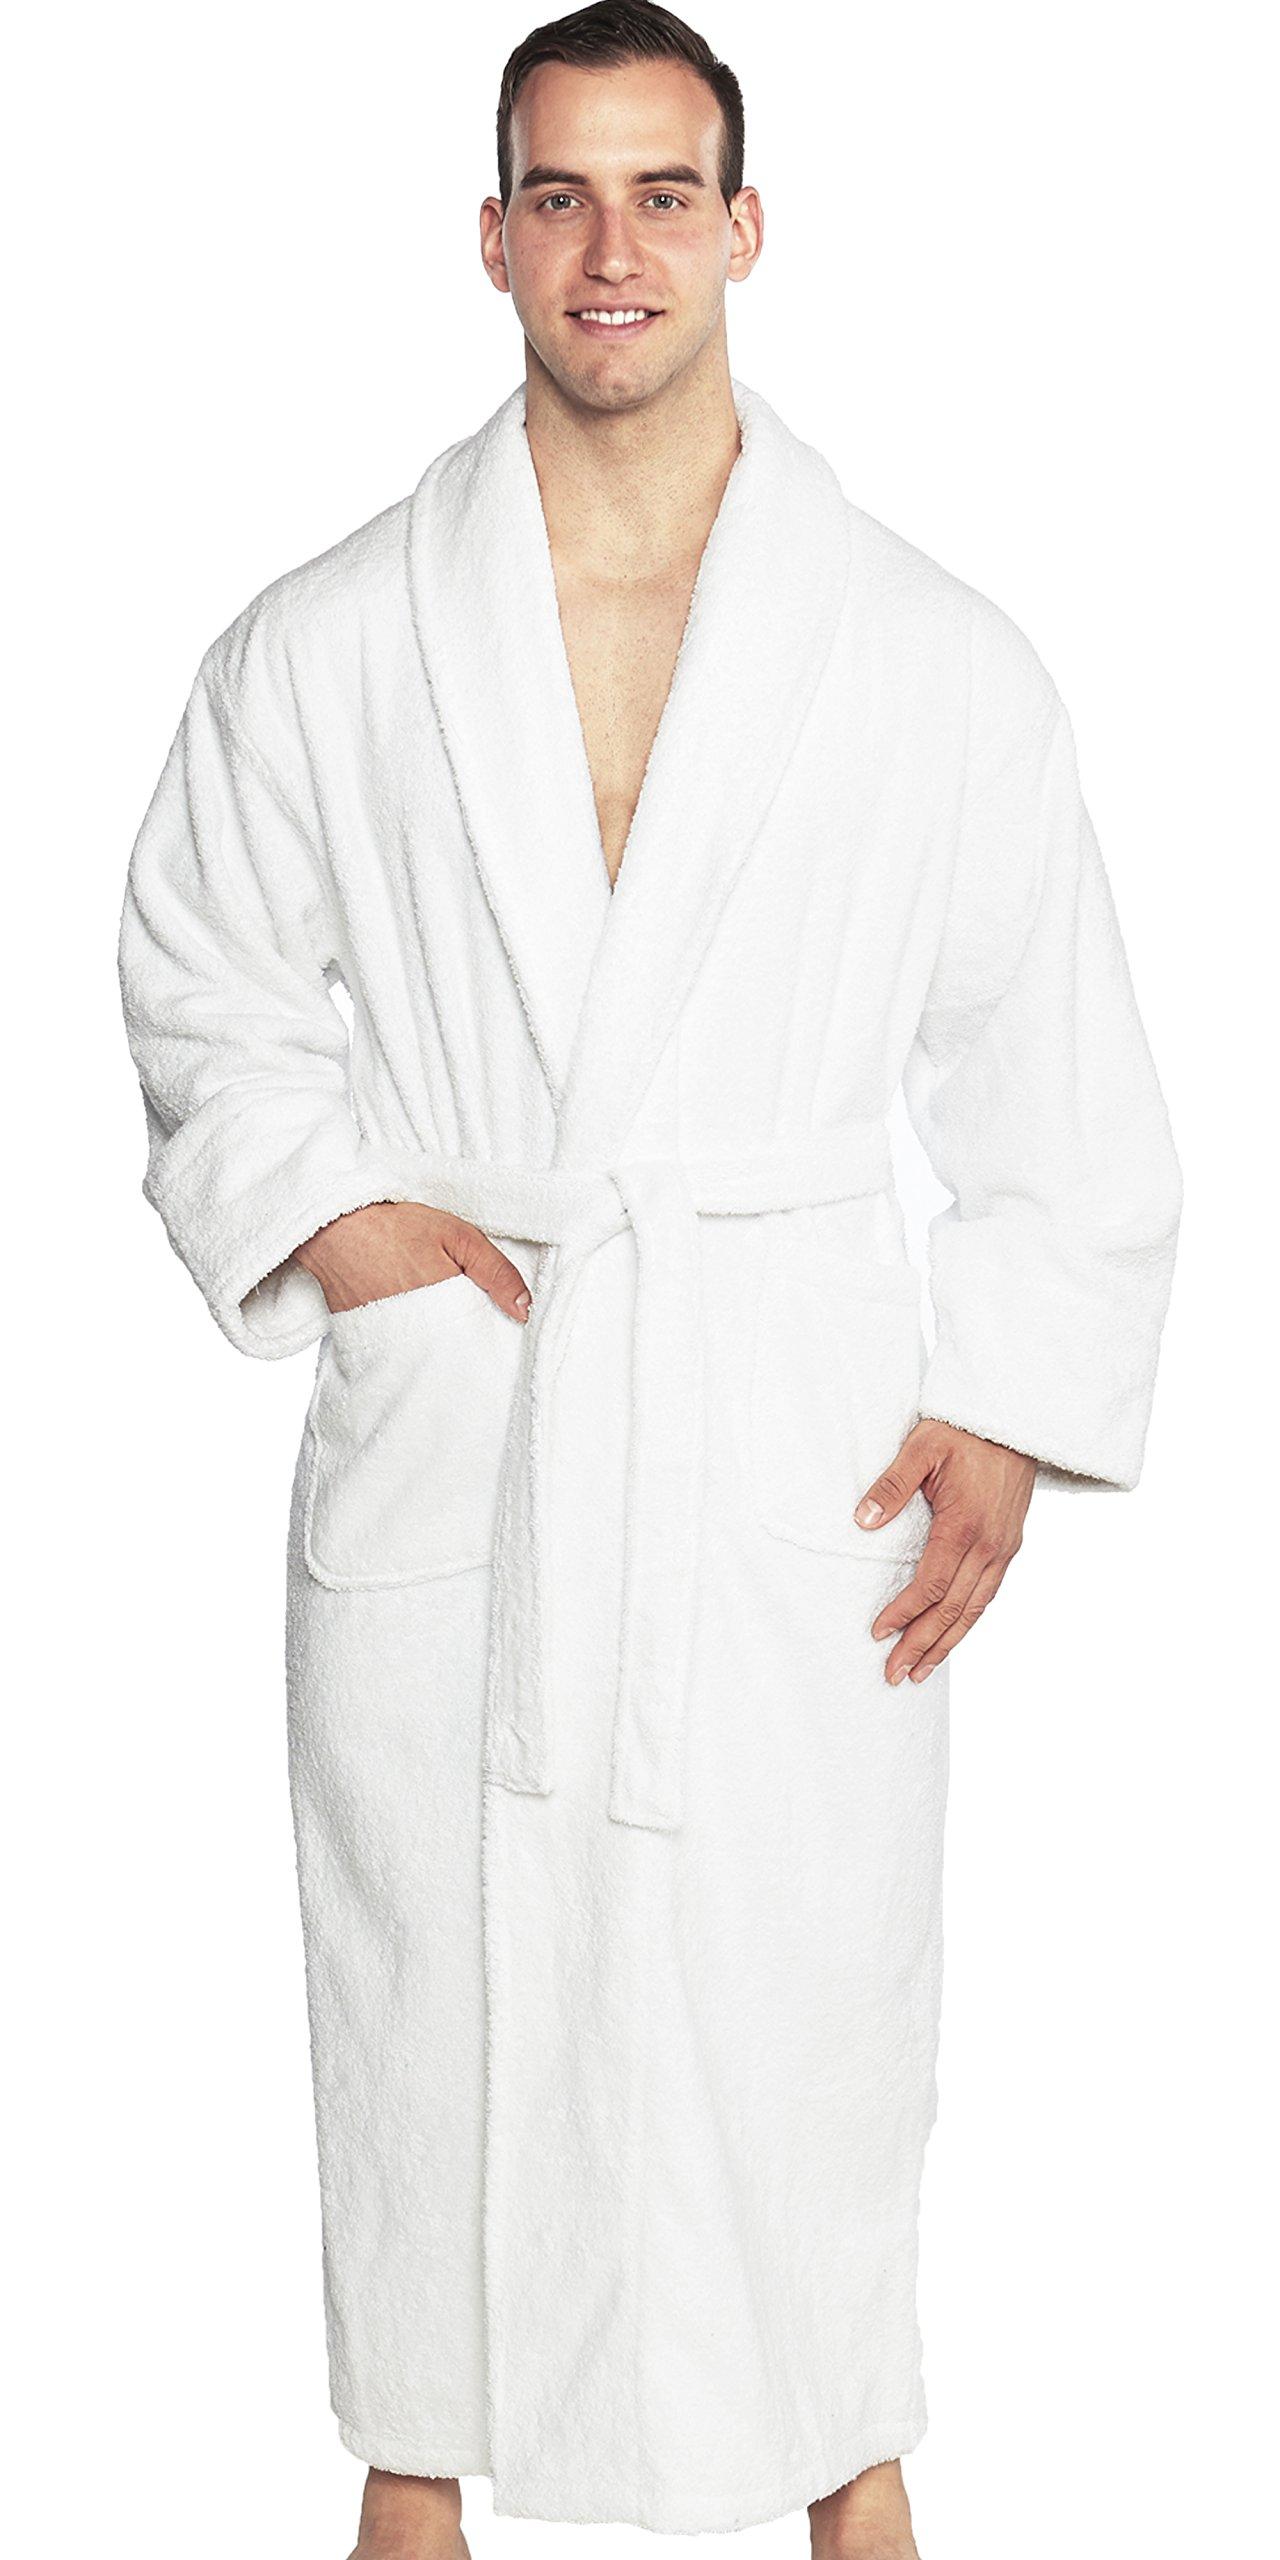 TurkishTowels Mens and Womens Original Terry Shawl Turkish Bathrobe-XL, White